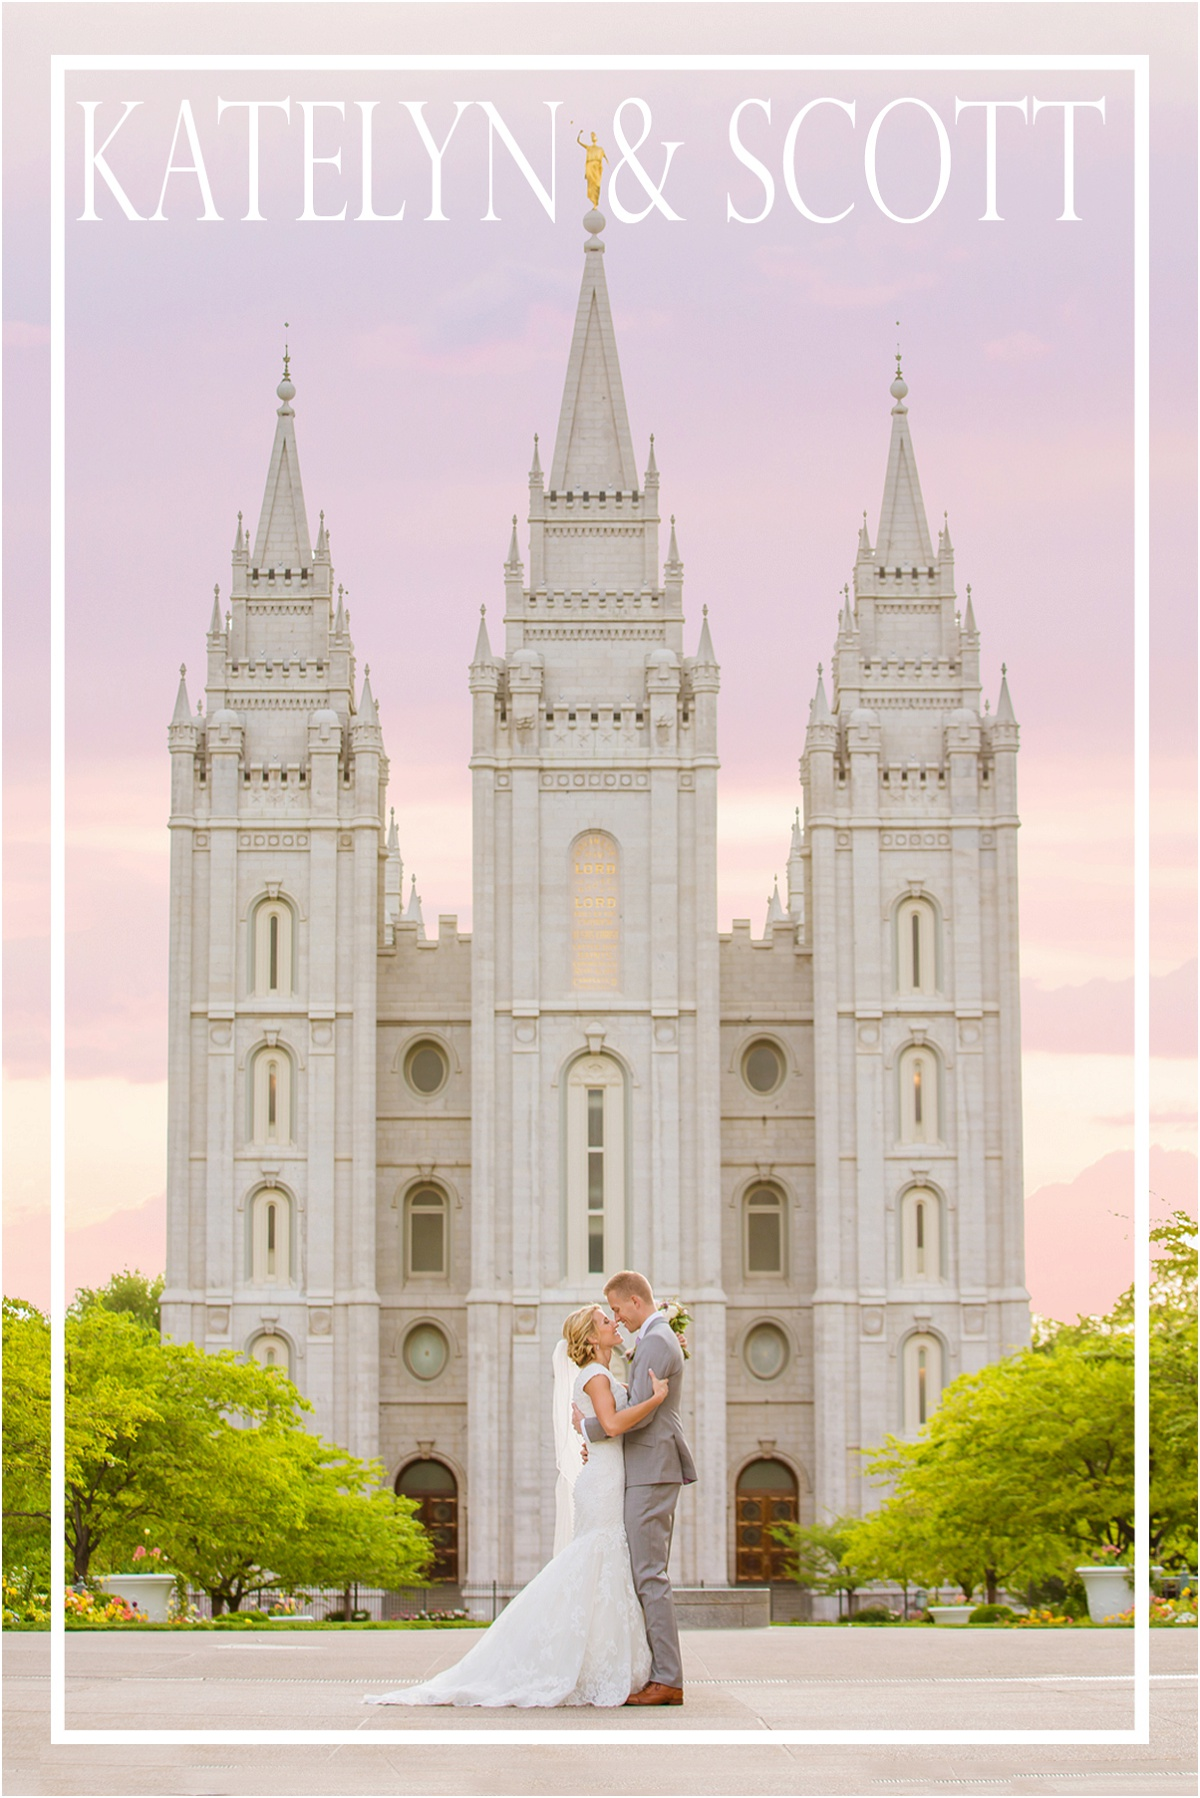 Terra Cooper Photography Weddings Brides 2015_5370.jpg